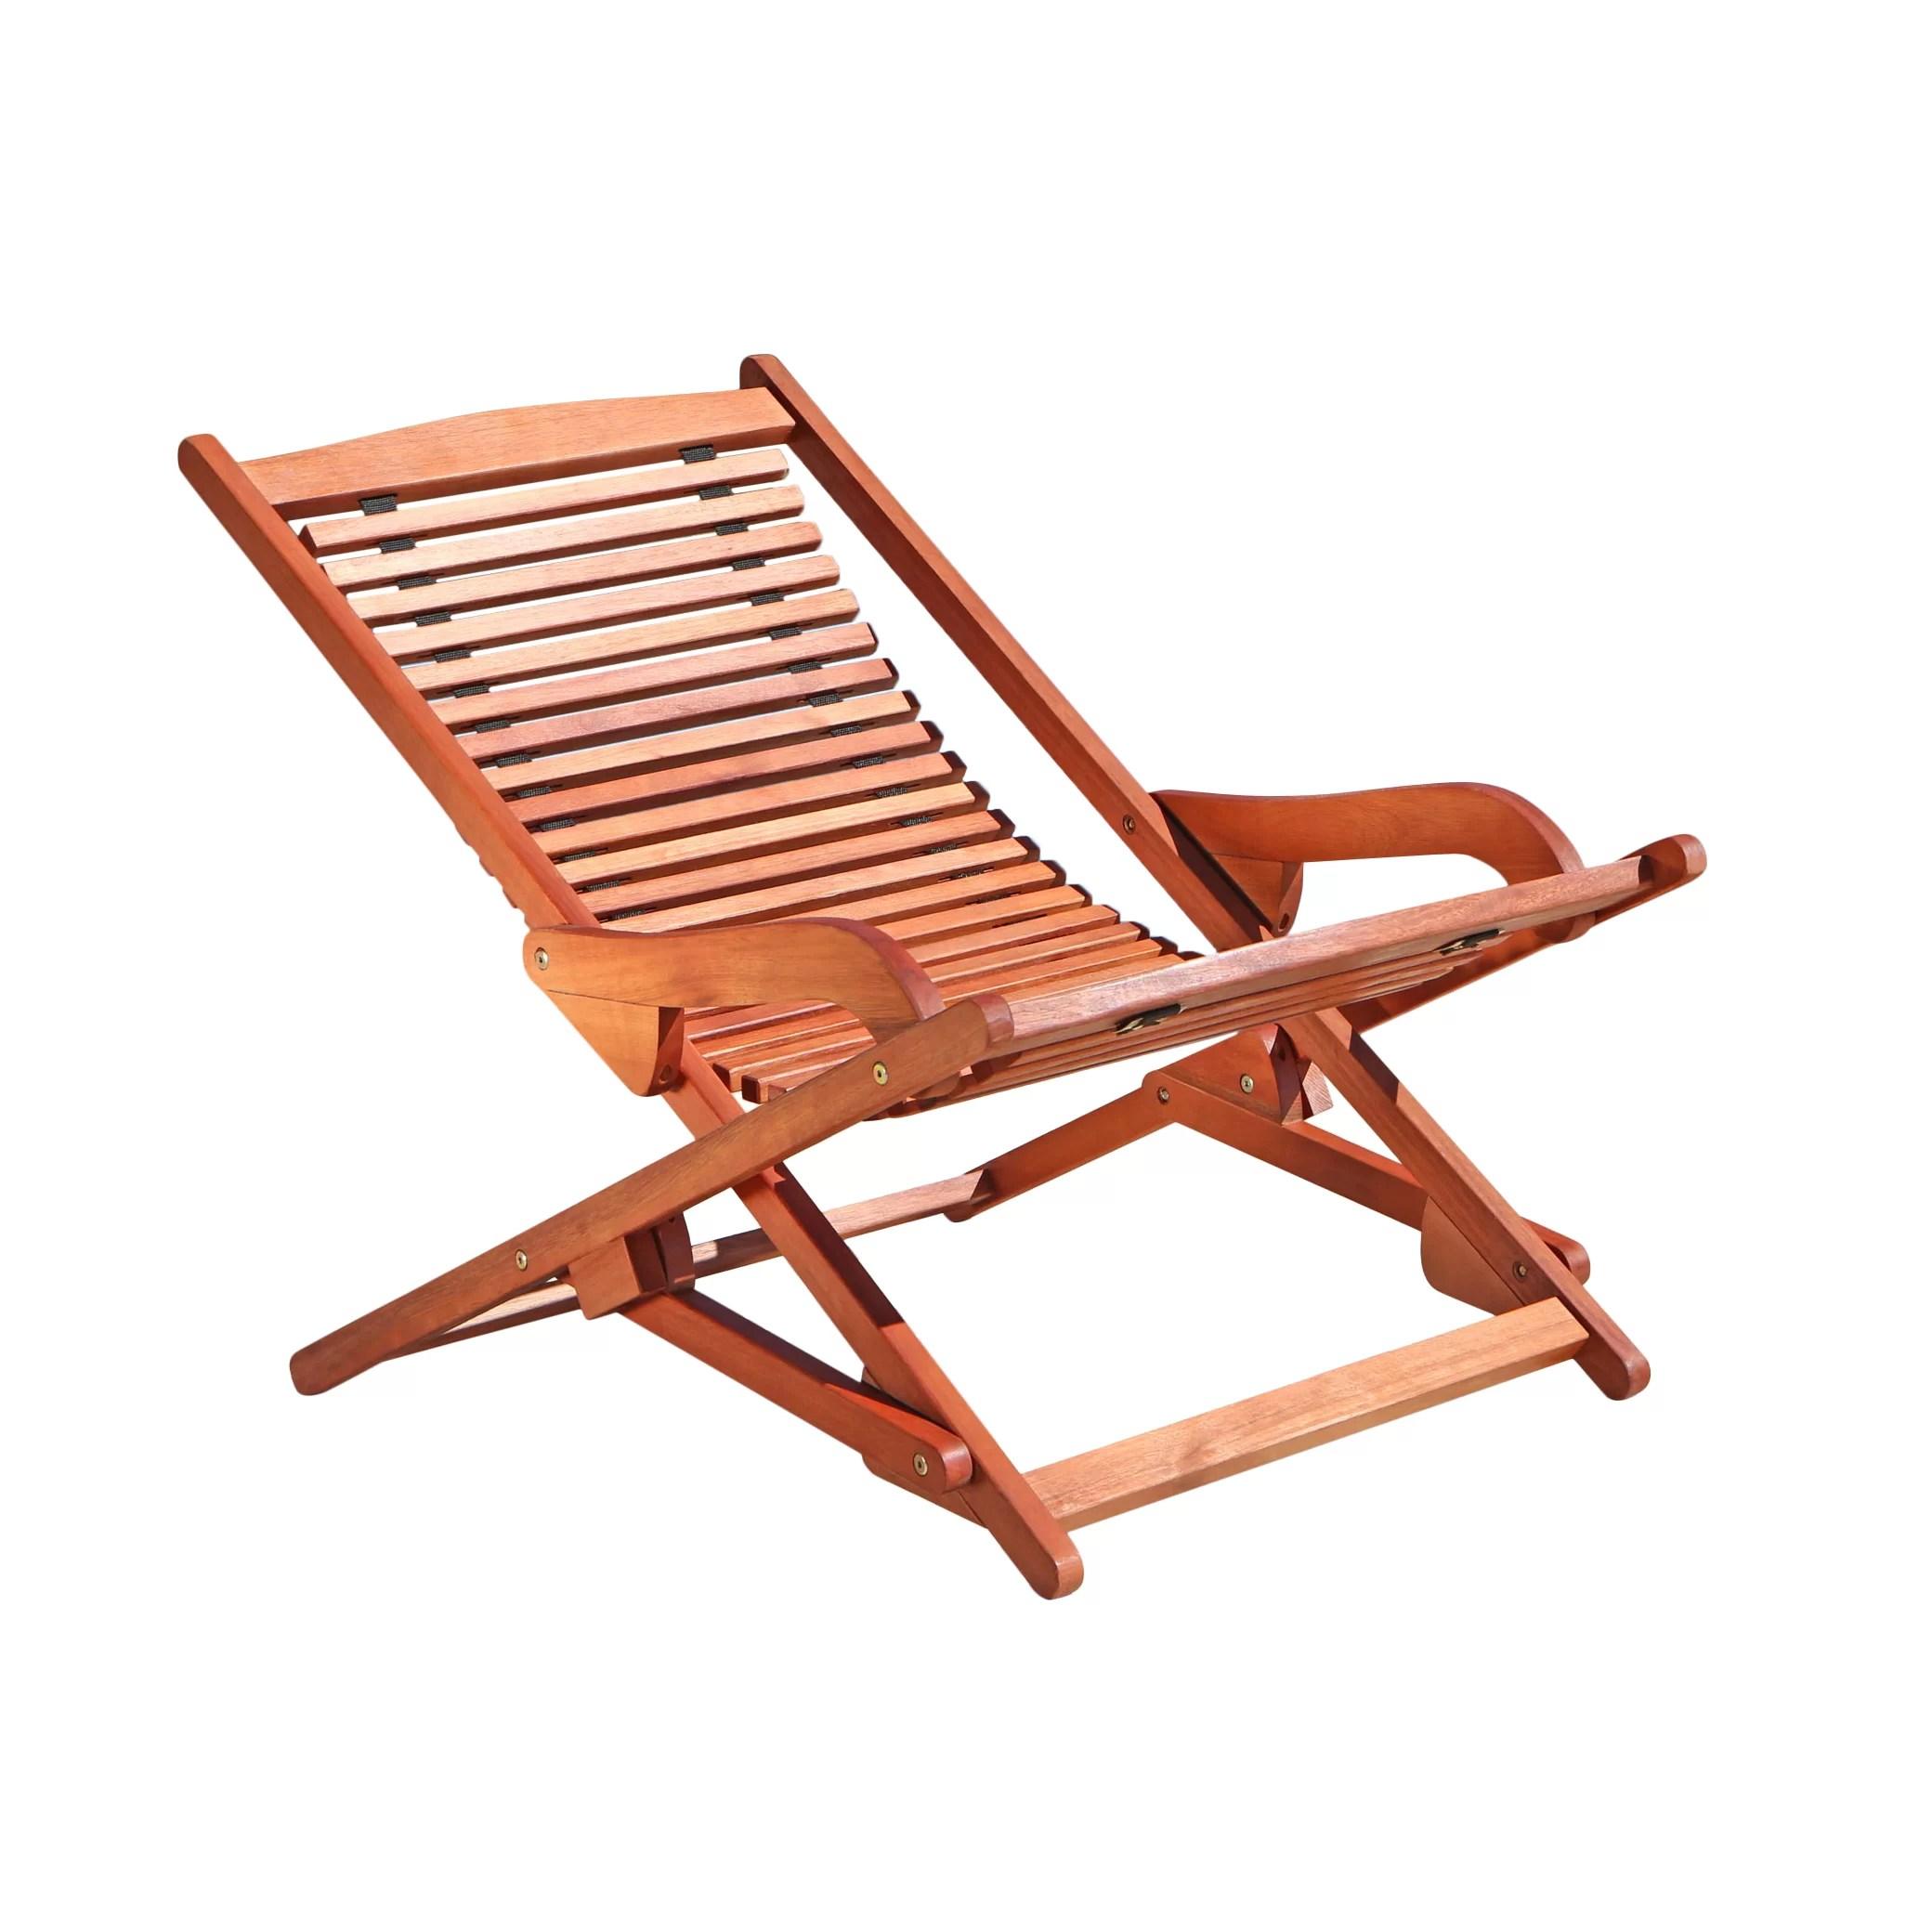 garden relaxer chair covers hanging kmart vifah outdoor zero gravity and reviews wayfair